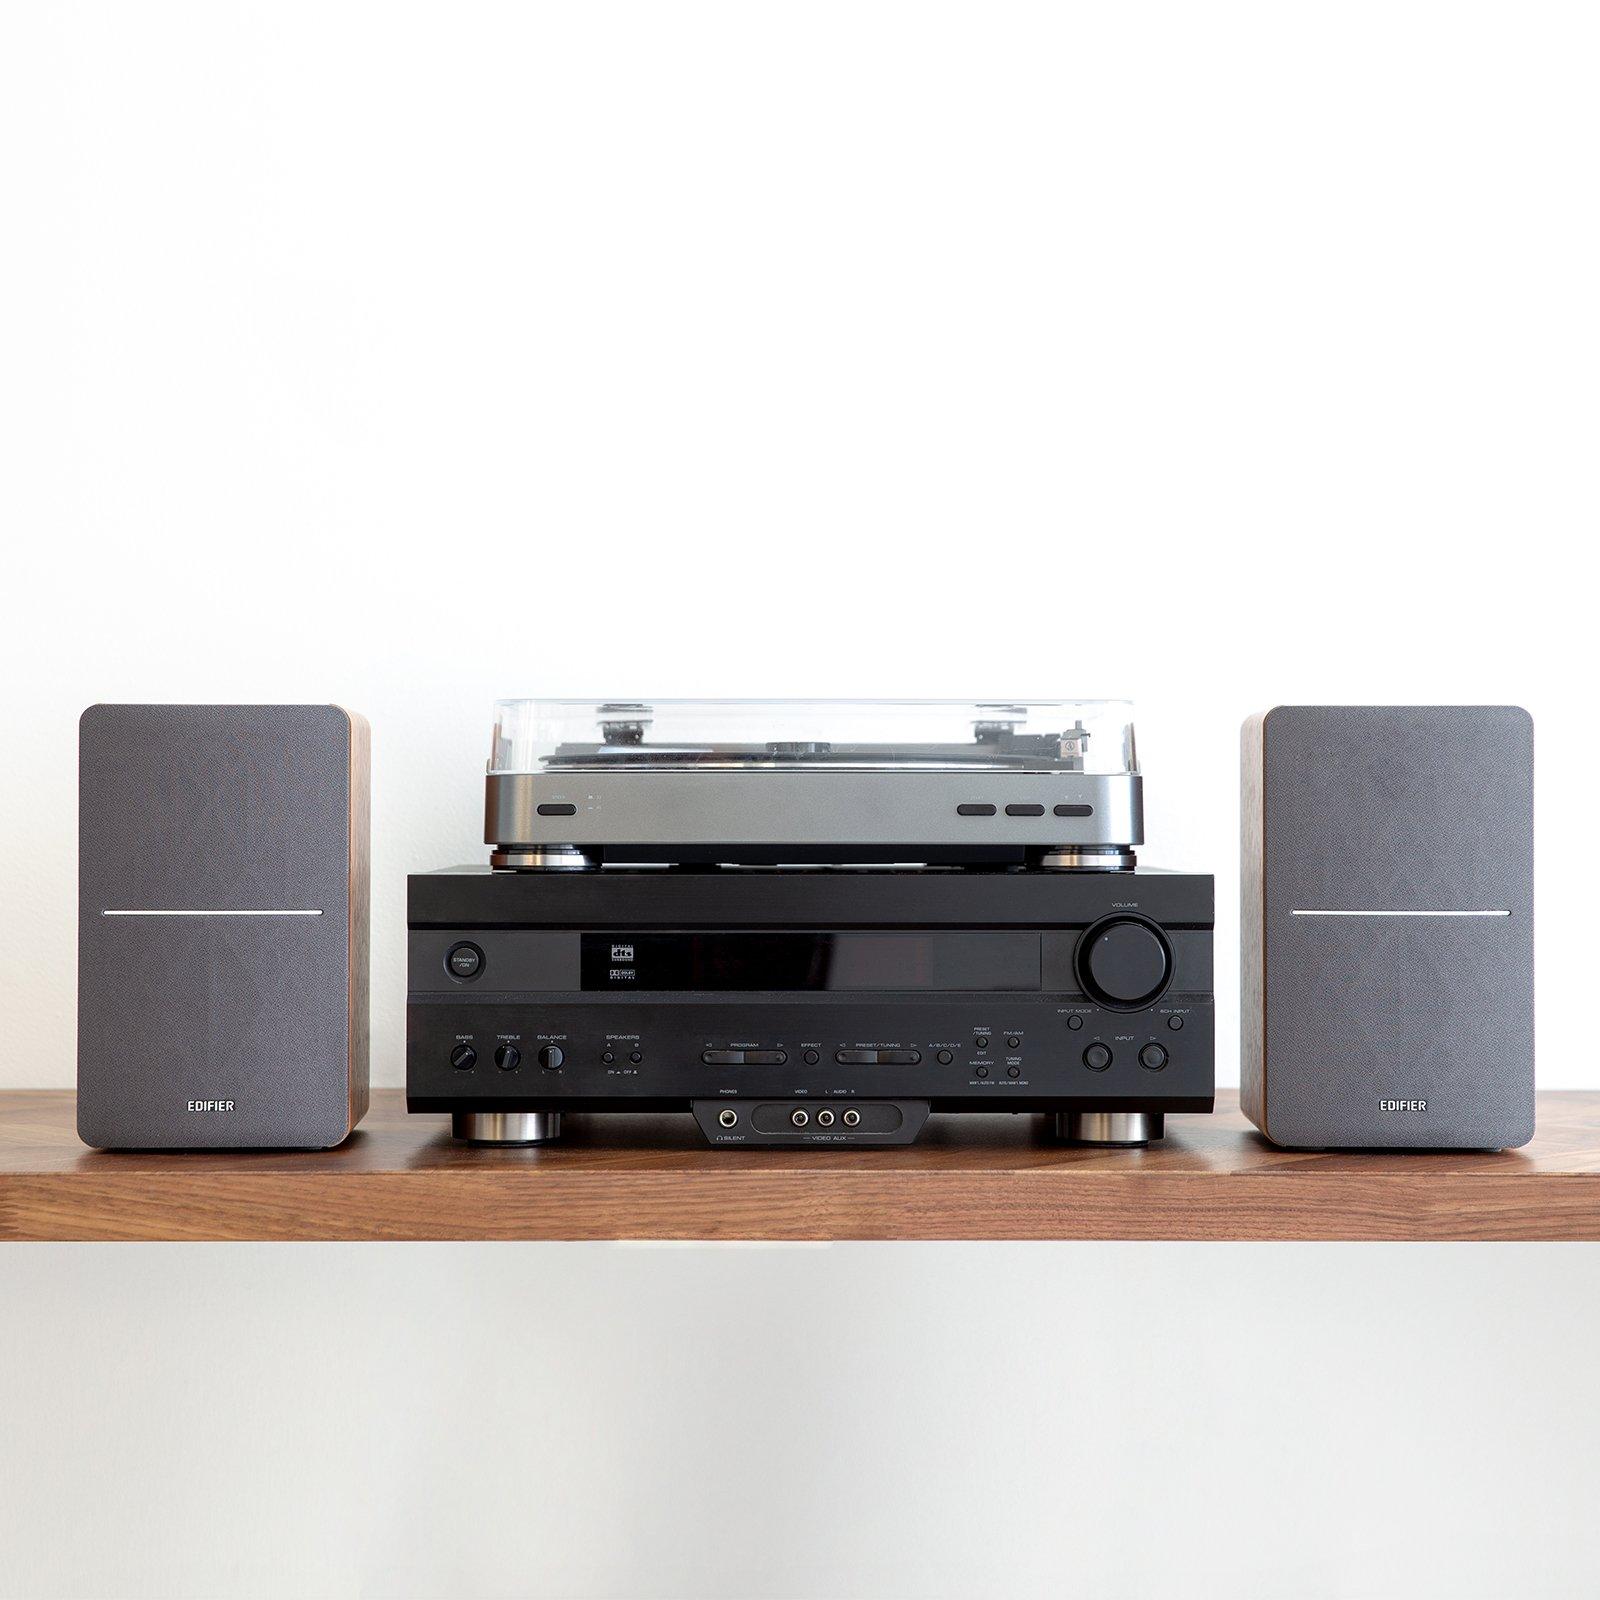 Edifier P12 Passive Bookshelf Speakers - 2-Way Speakers with Built-in Wall-Mount Bracket - Wood Color, Pair by Edifier (Image #6)